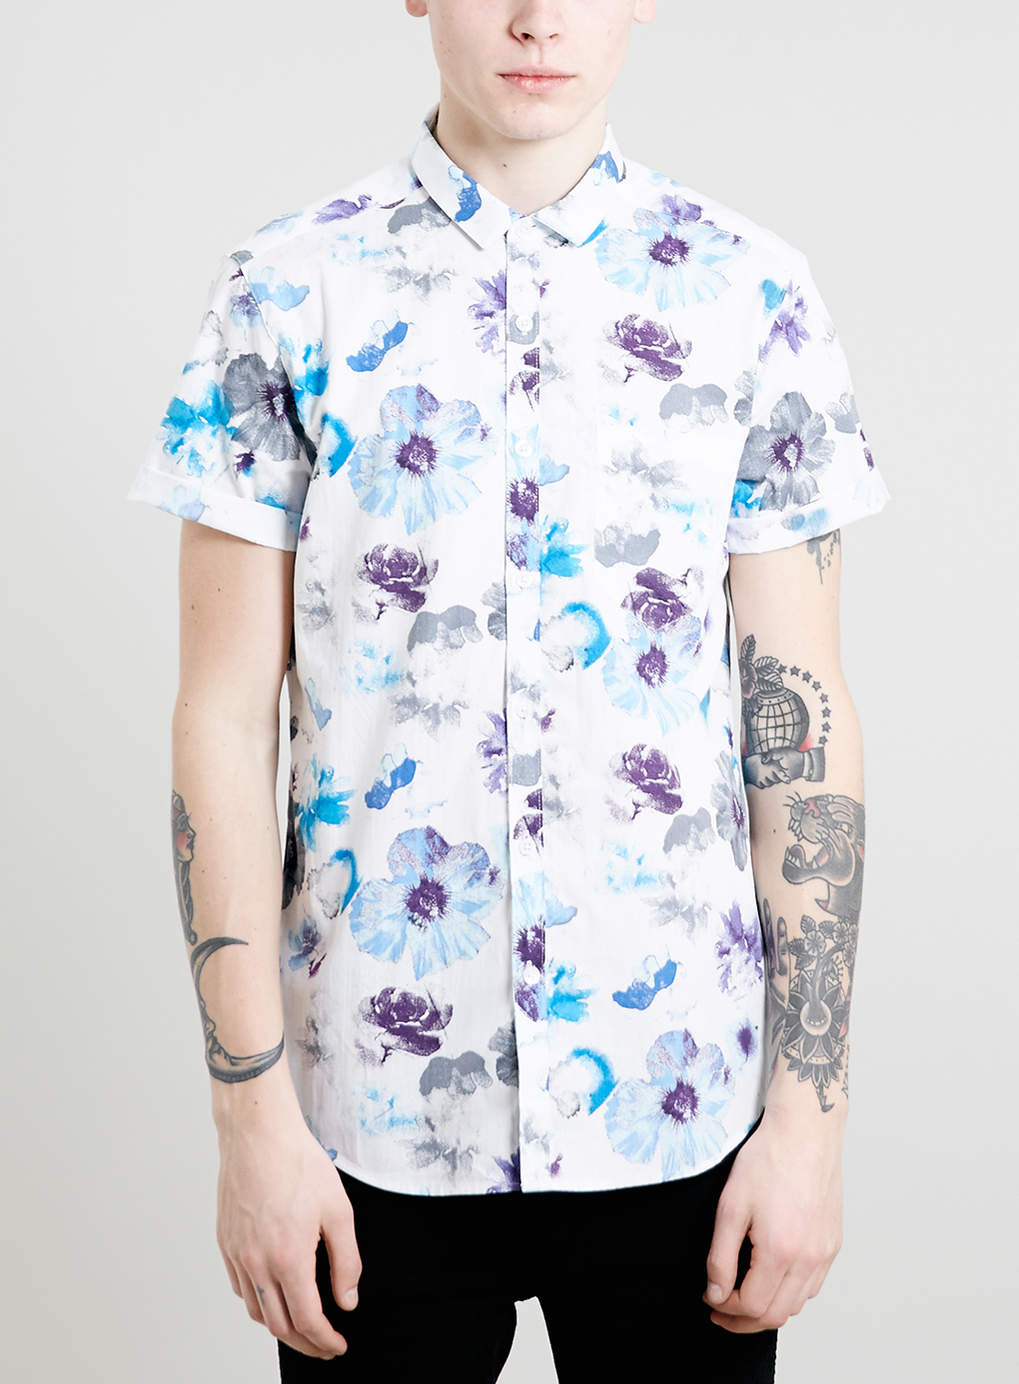 White Floral Print Short Sleeve Shirt, $55